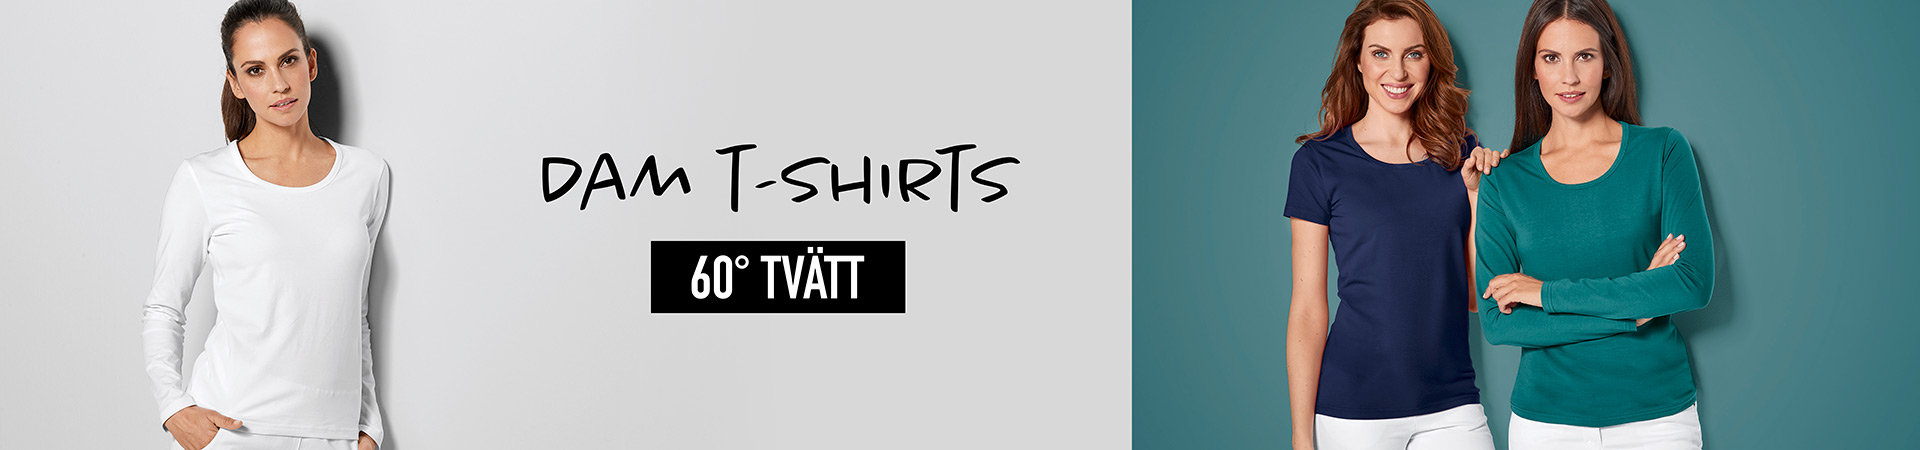 Dam t-shirts - 7days